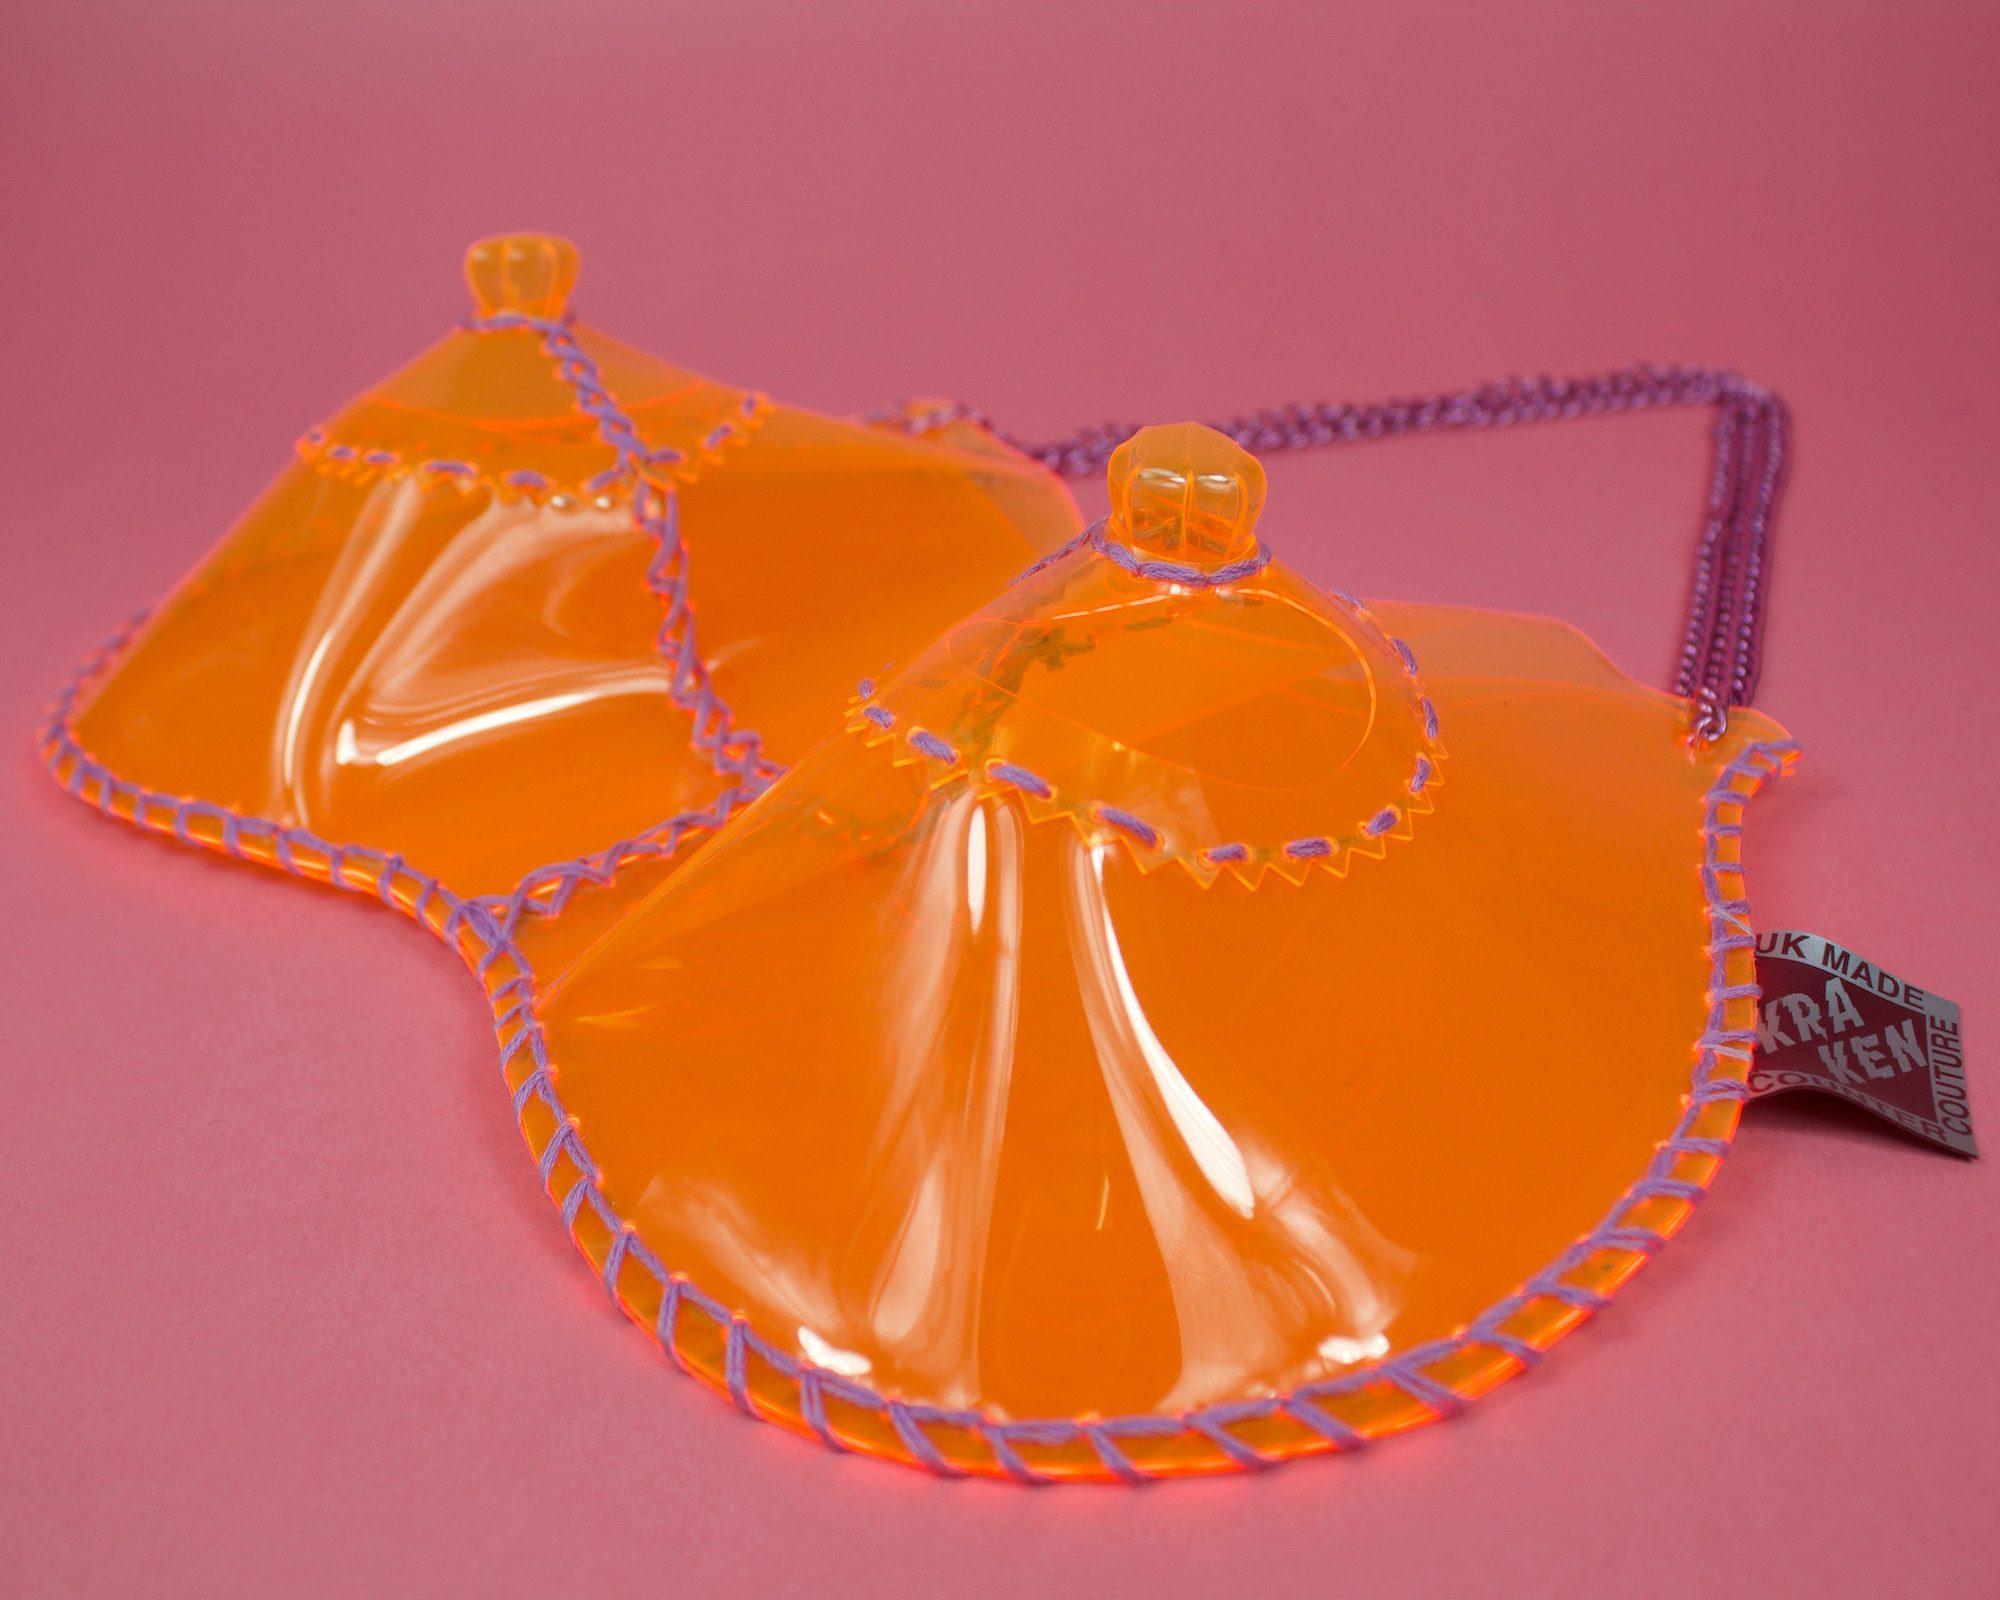 boobies-handbag-bag-clear-orange-pvc-bows-KrakenCounterCouture-purple-handmade-london-nipples